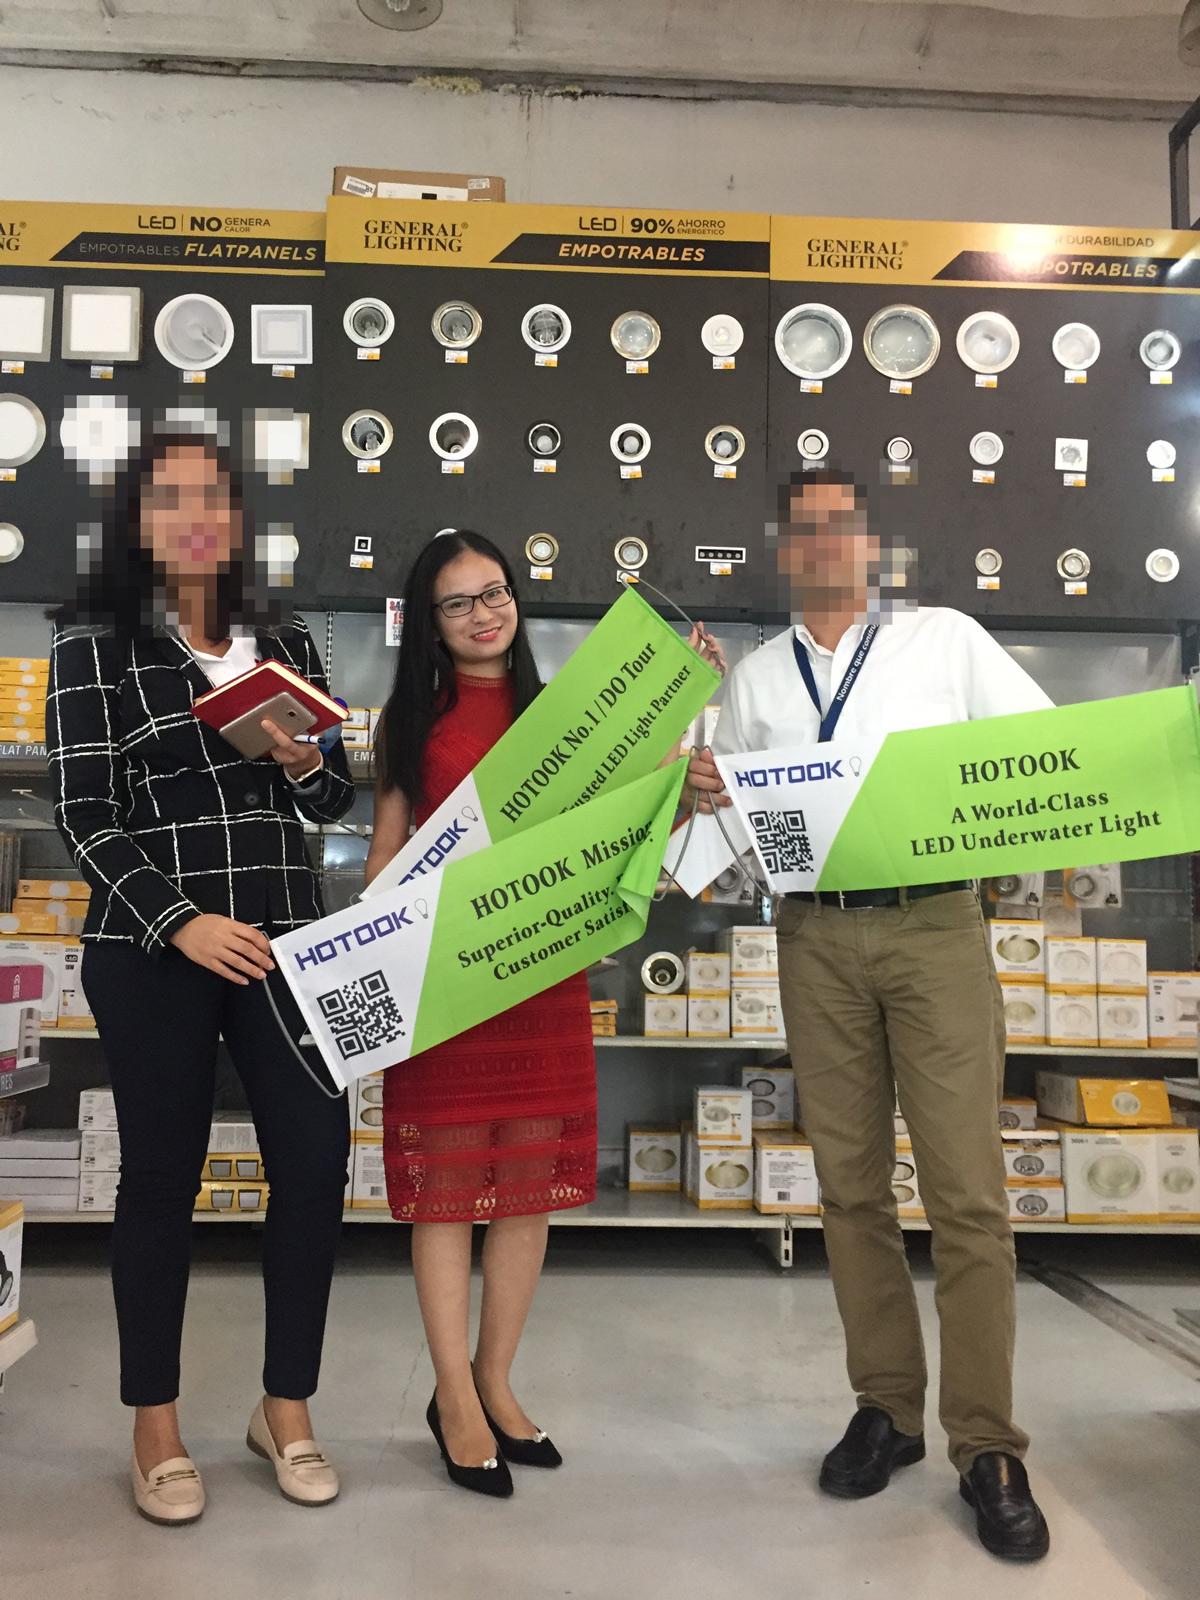 Strategic Cooperation in Supermarket